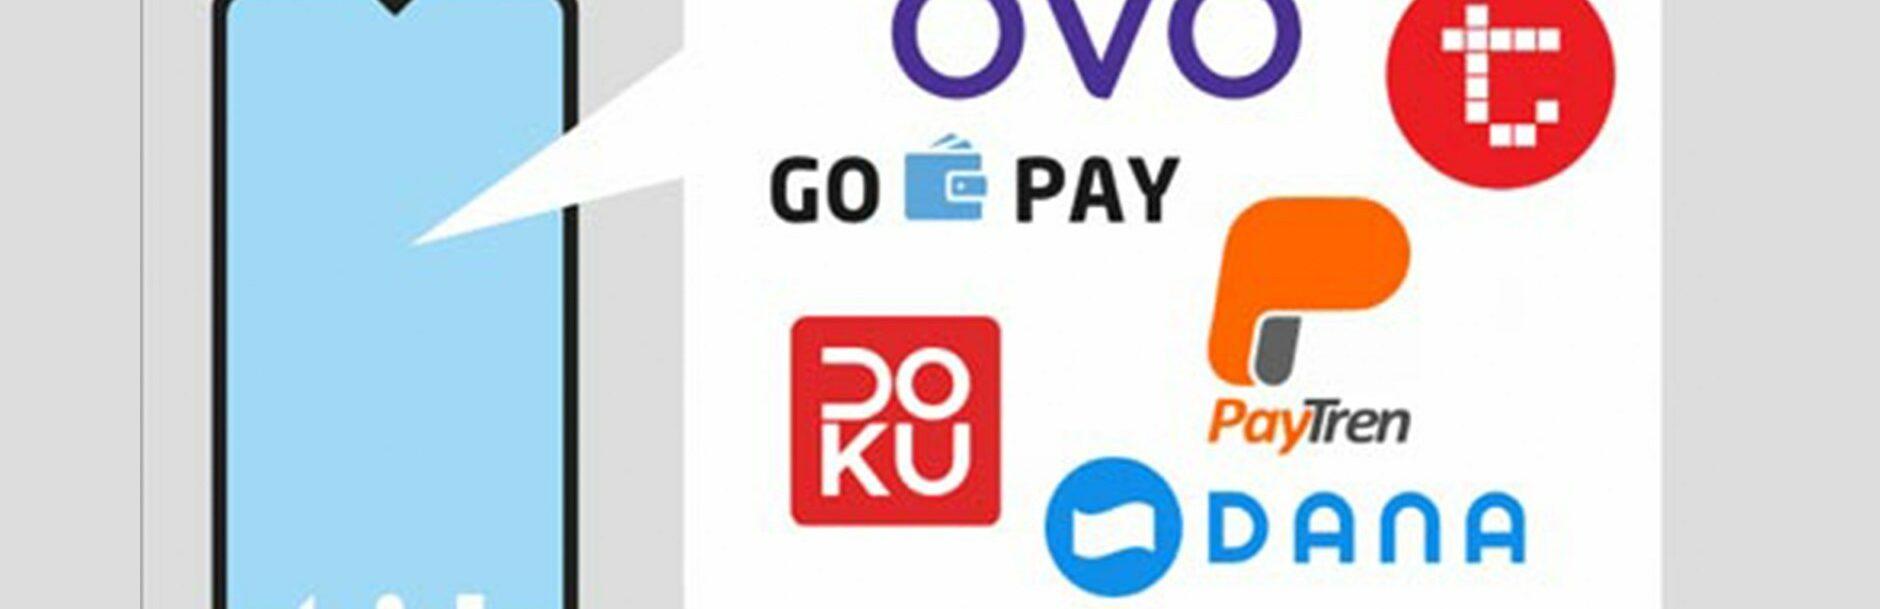 e-wallet dompet masa kini